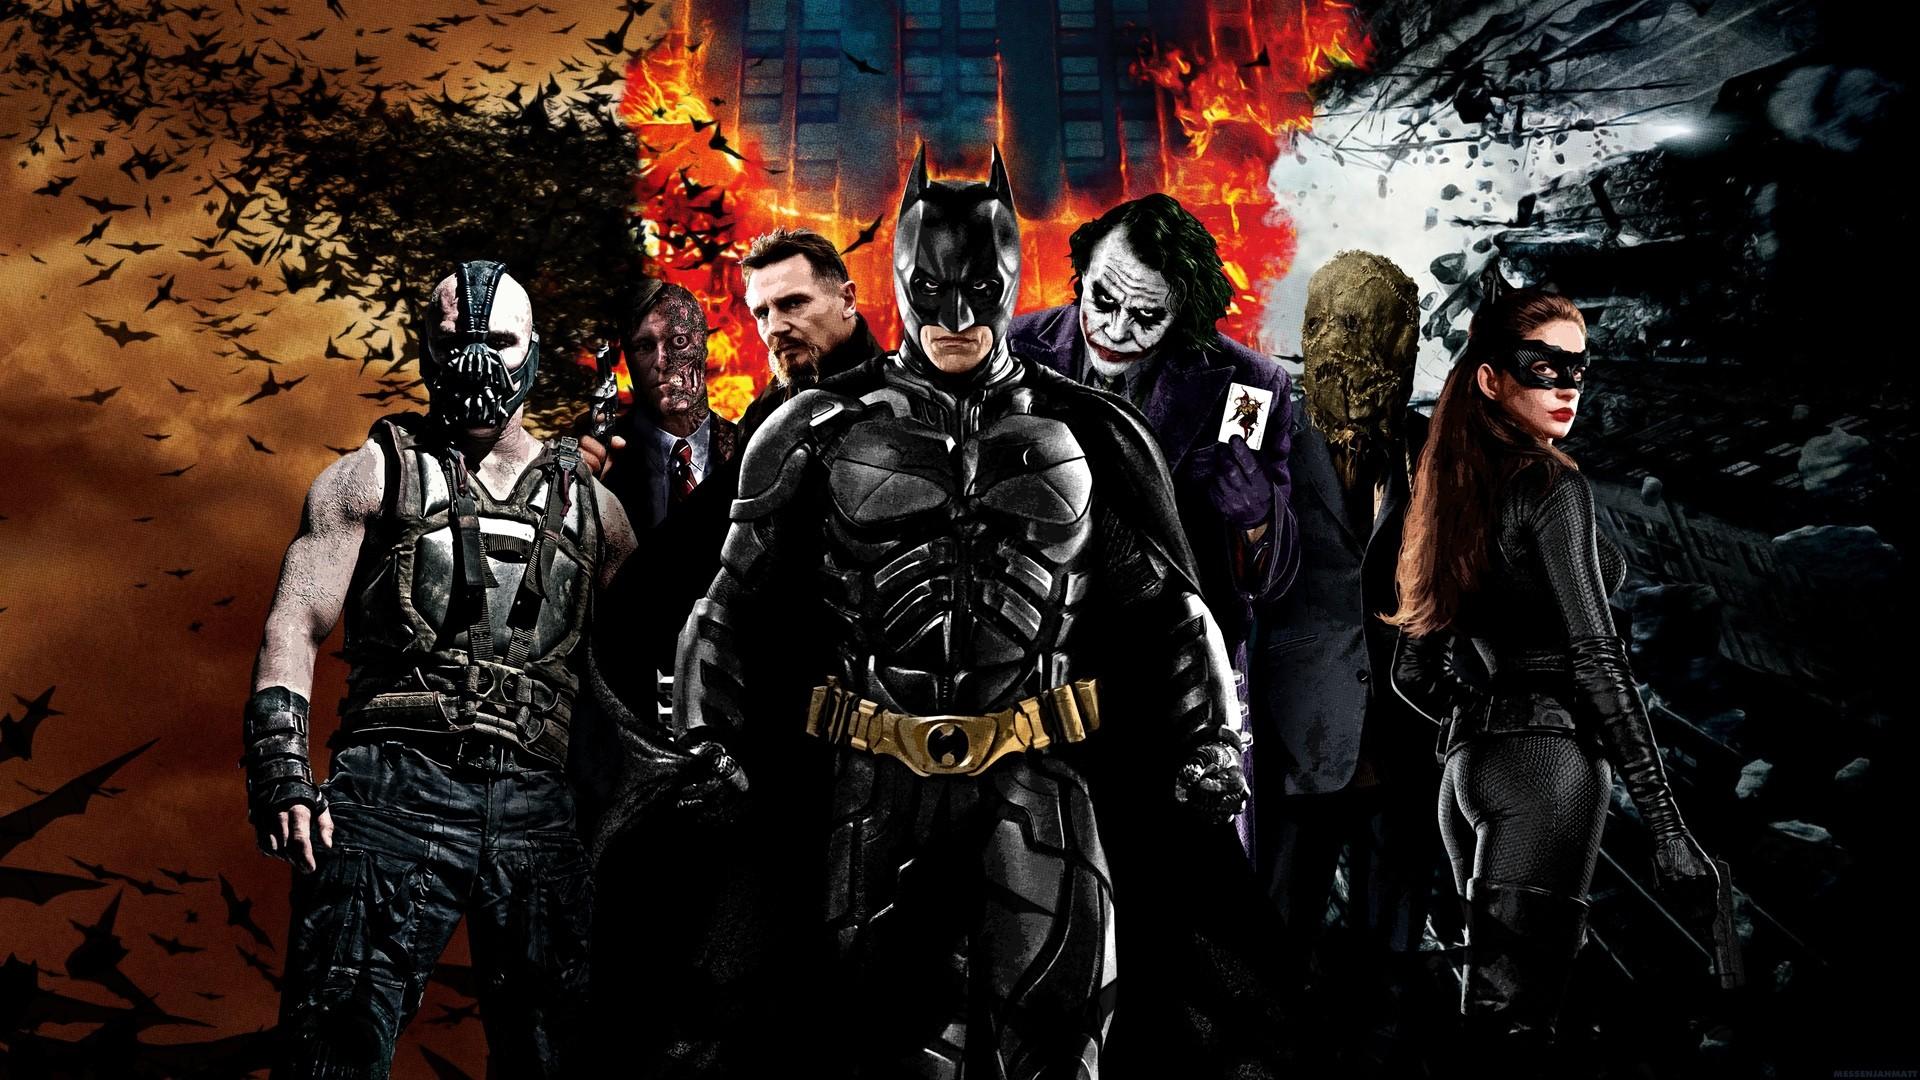 Dark Knight HD wallpaper